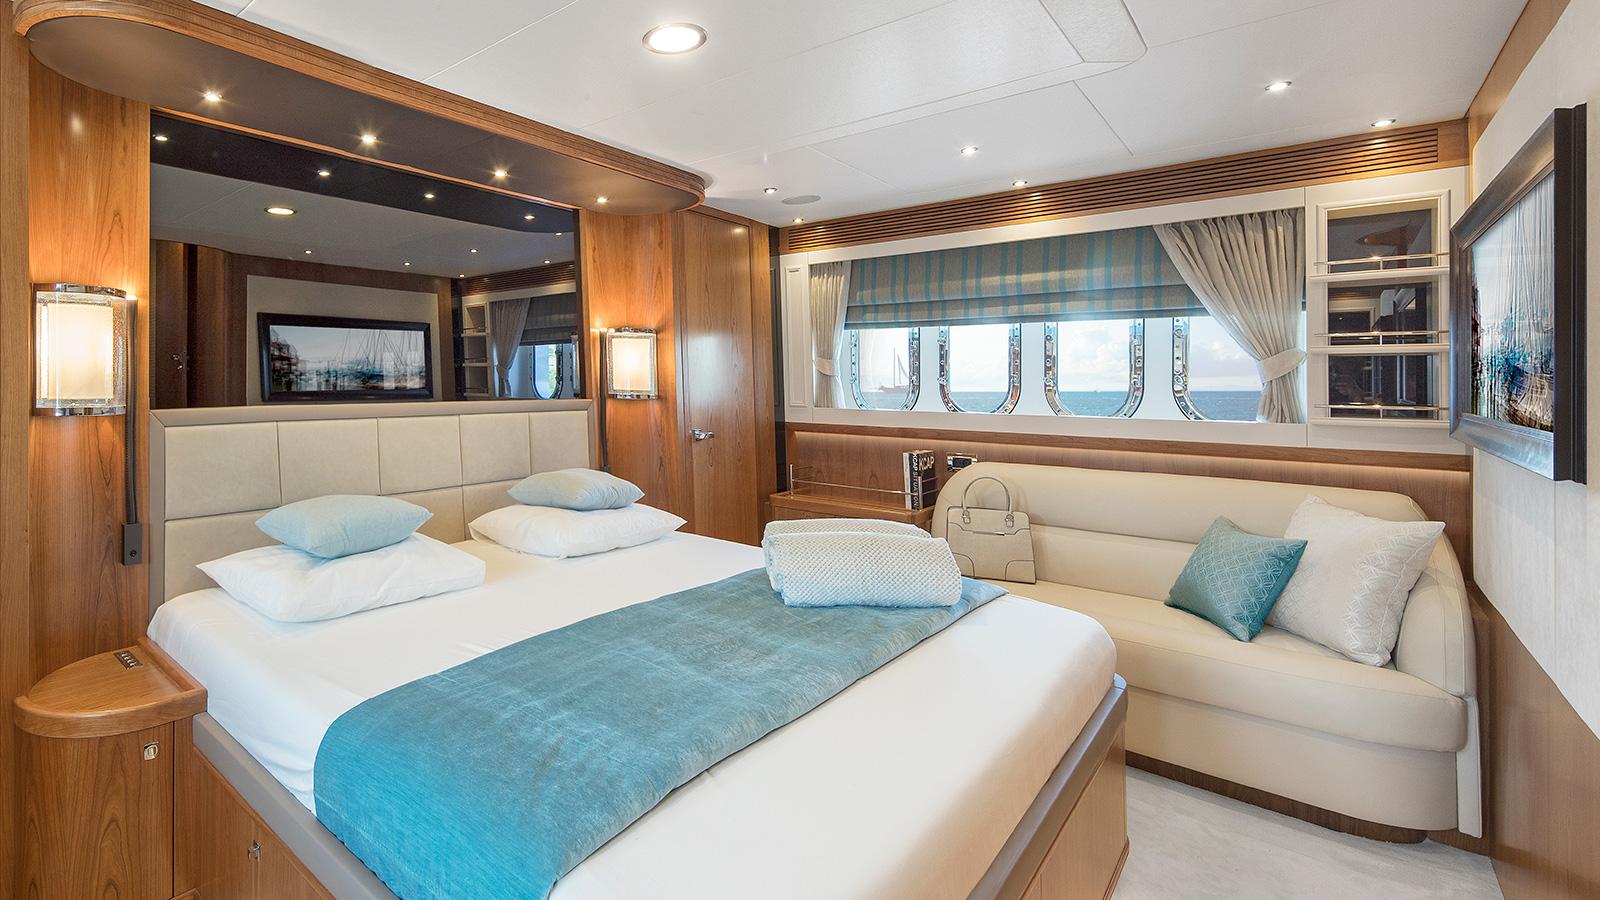 the-master-cabin-of-the-van-der-valk-motor-yacht-anemeli